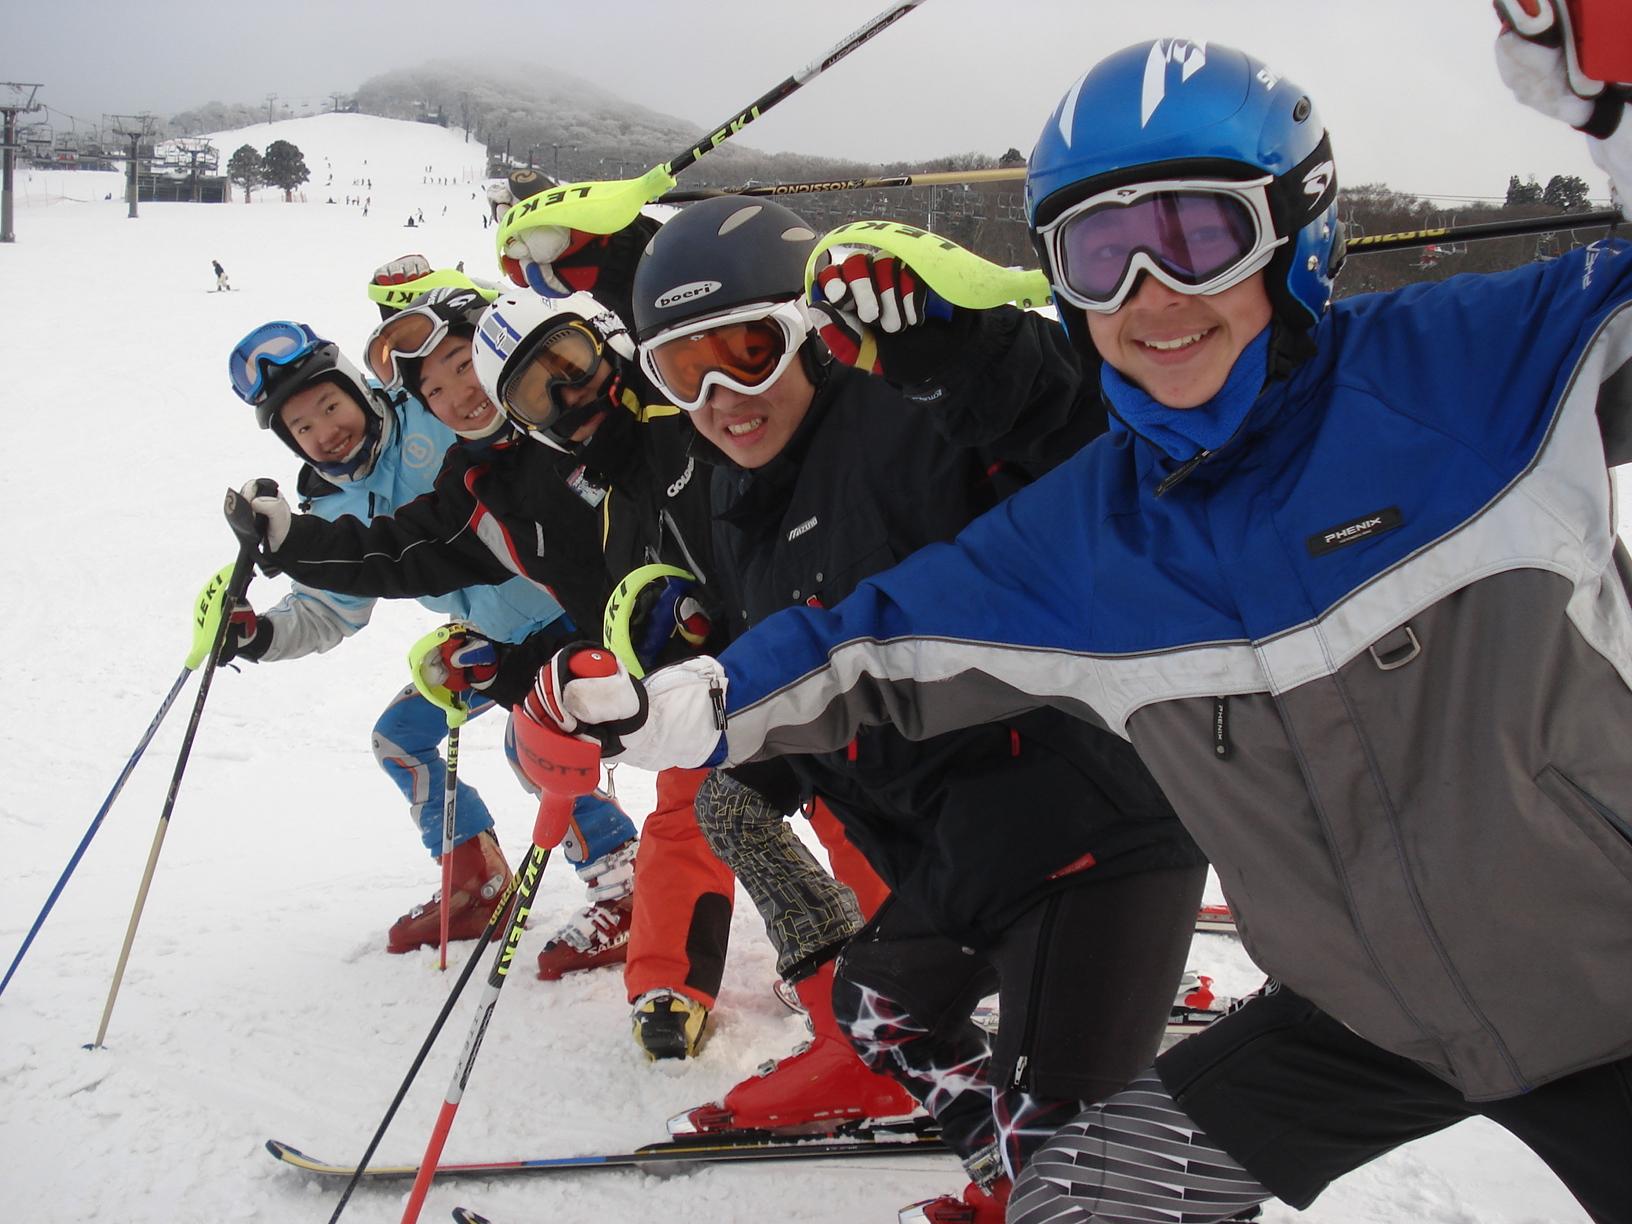 Grow Up Ski School(グローアップスキースクール)